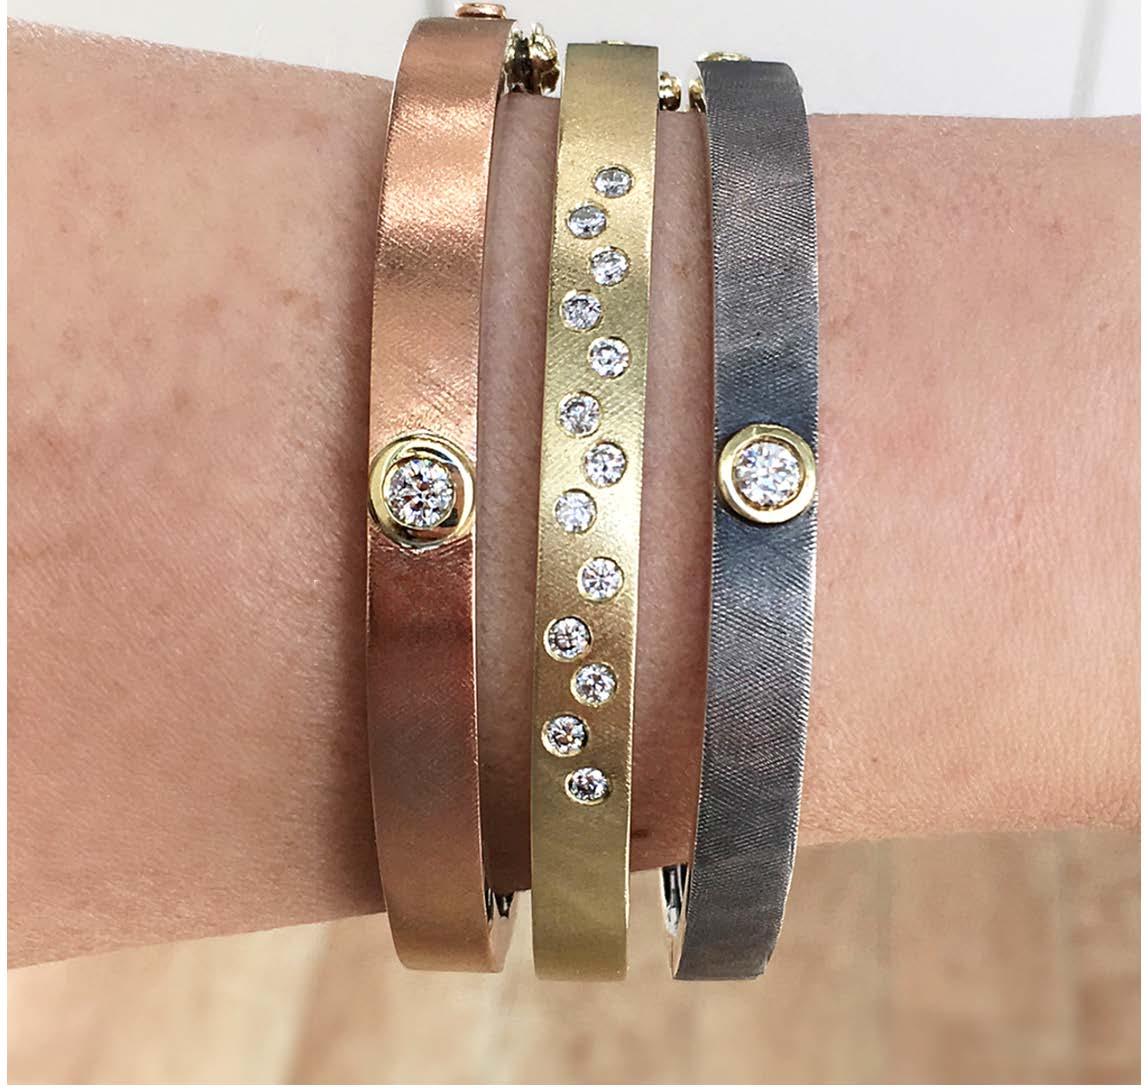 The Jewel - Rene Escobar - Lookbook - Bronze, Gold and Silver Bracelets